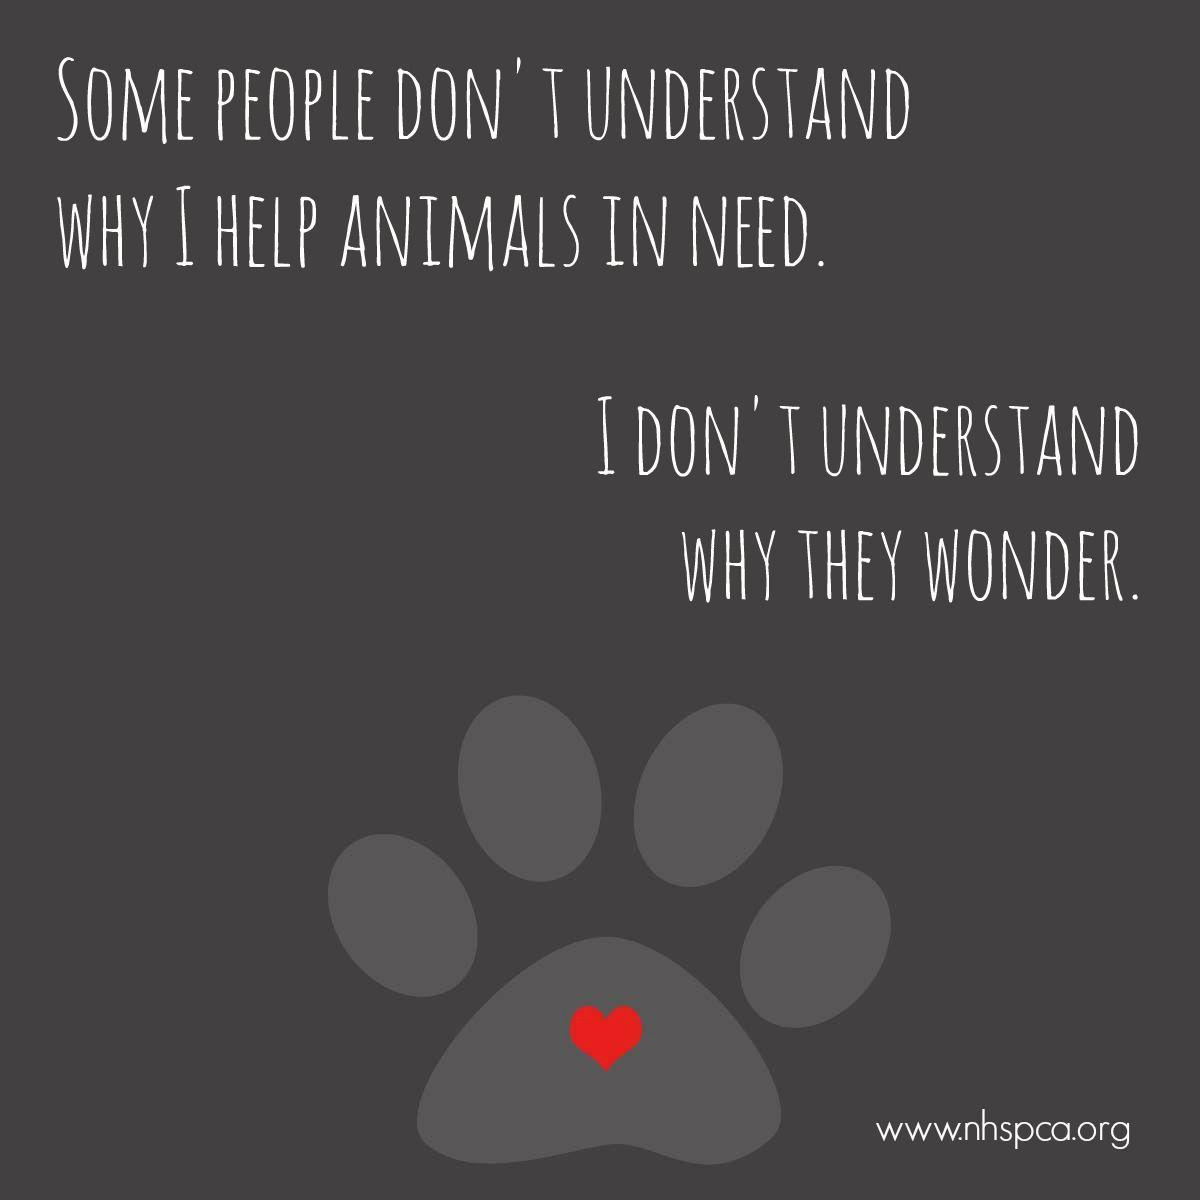 Animal lovers understand perfectly. #adopt #resuce #nhspca ...